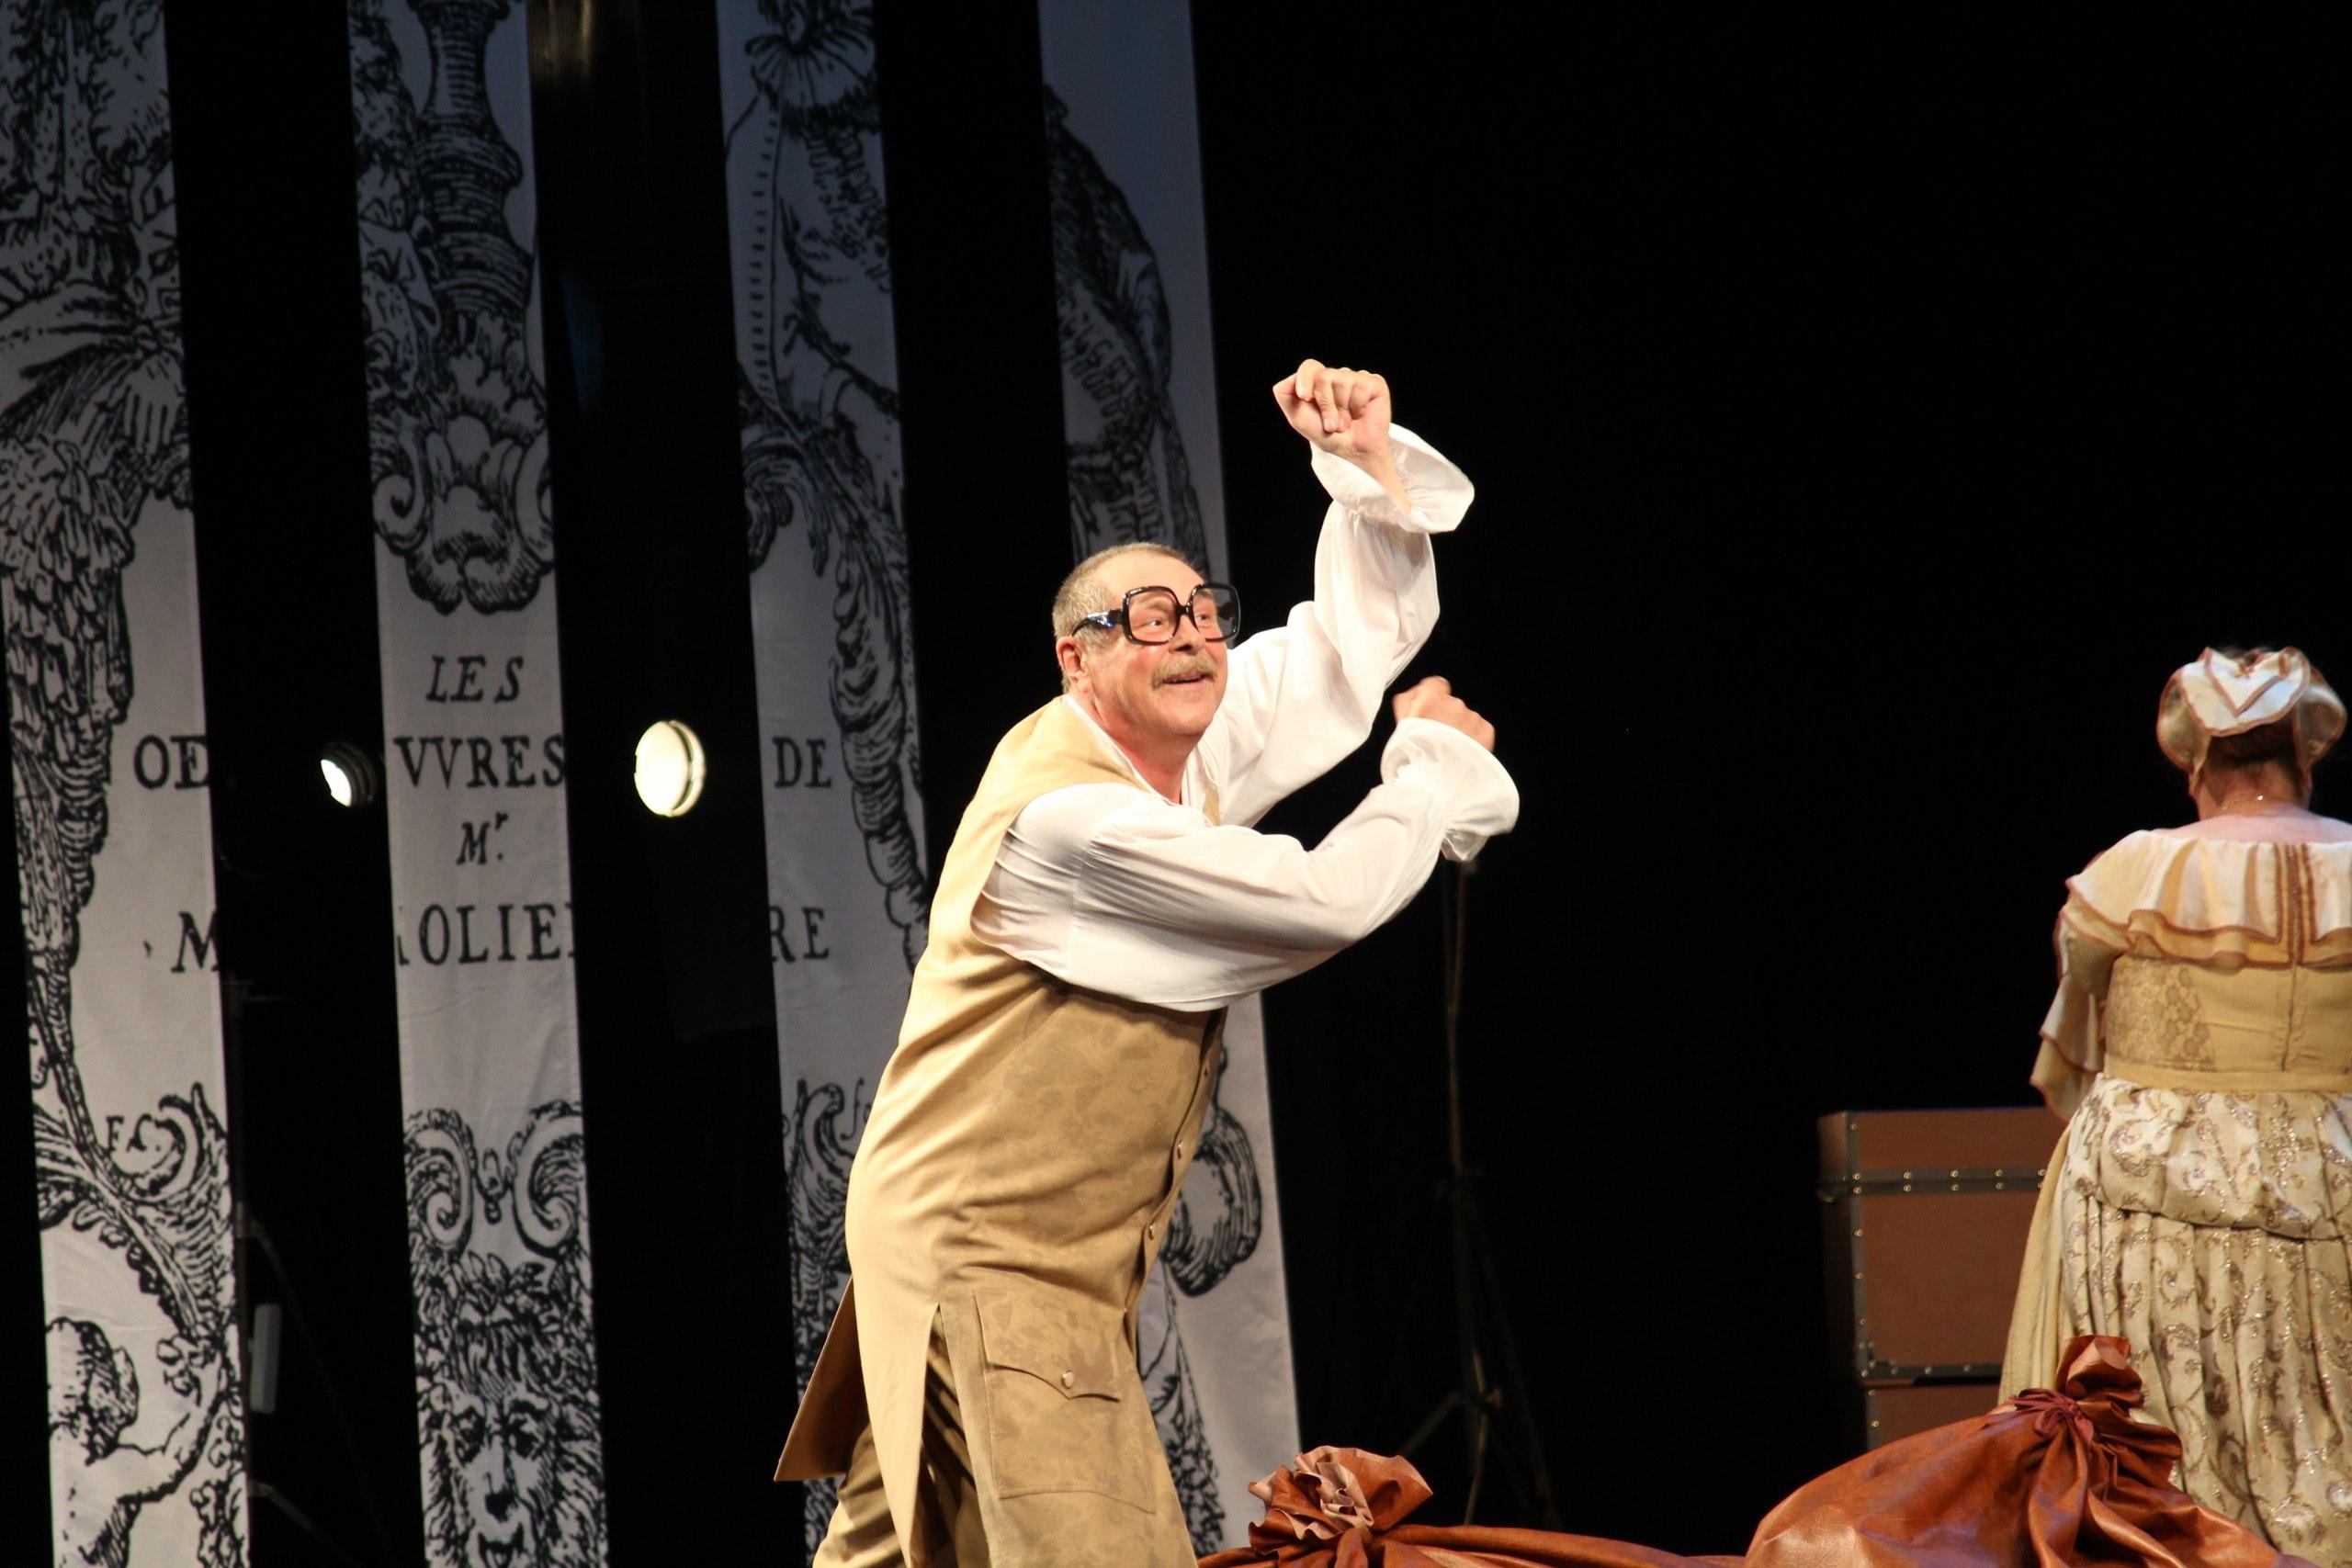 Онлайн-трансляция спектакля «Скупой» по пьесе Жана-Батиста Мольера